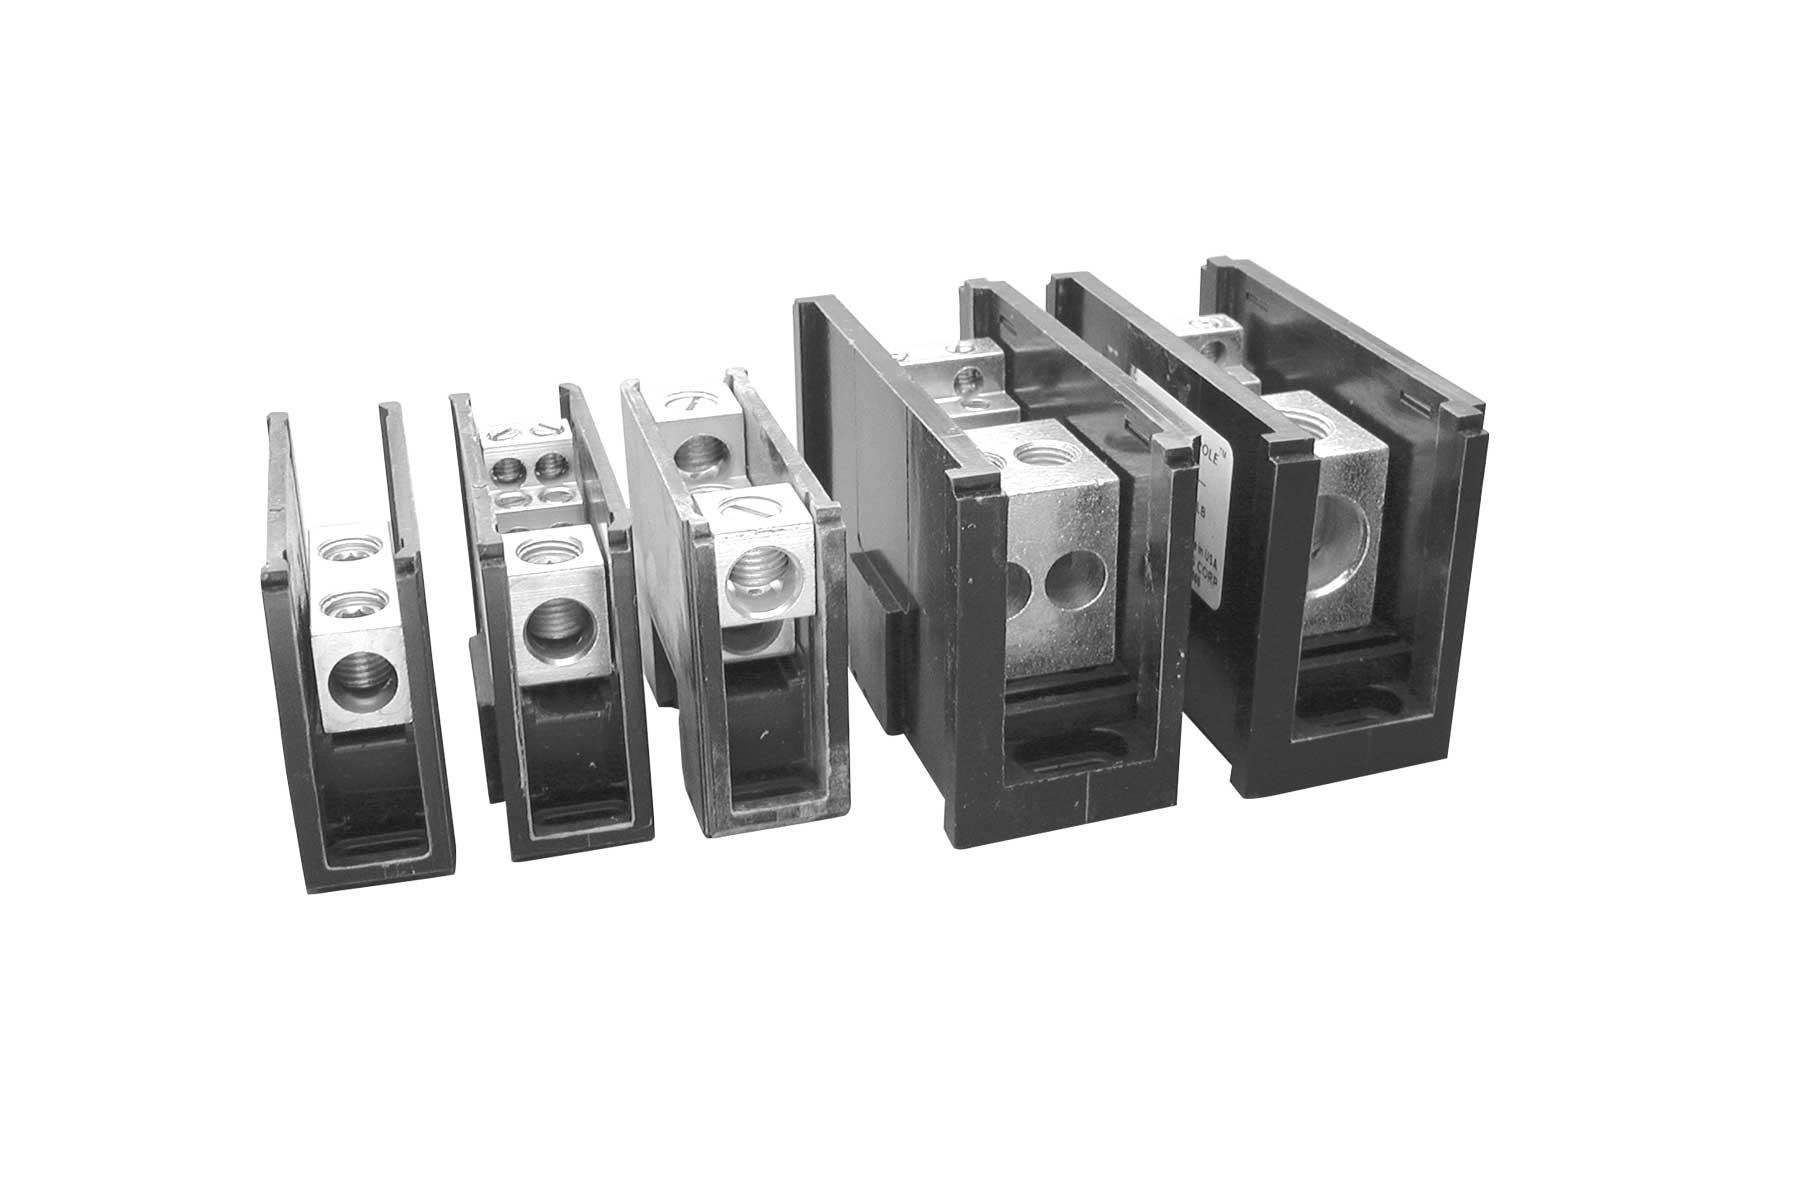 Linkable Power Distribution Block